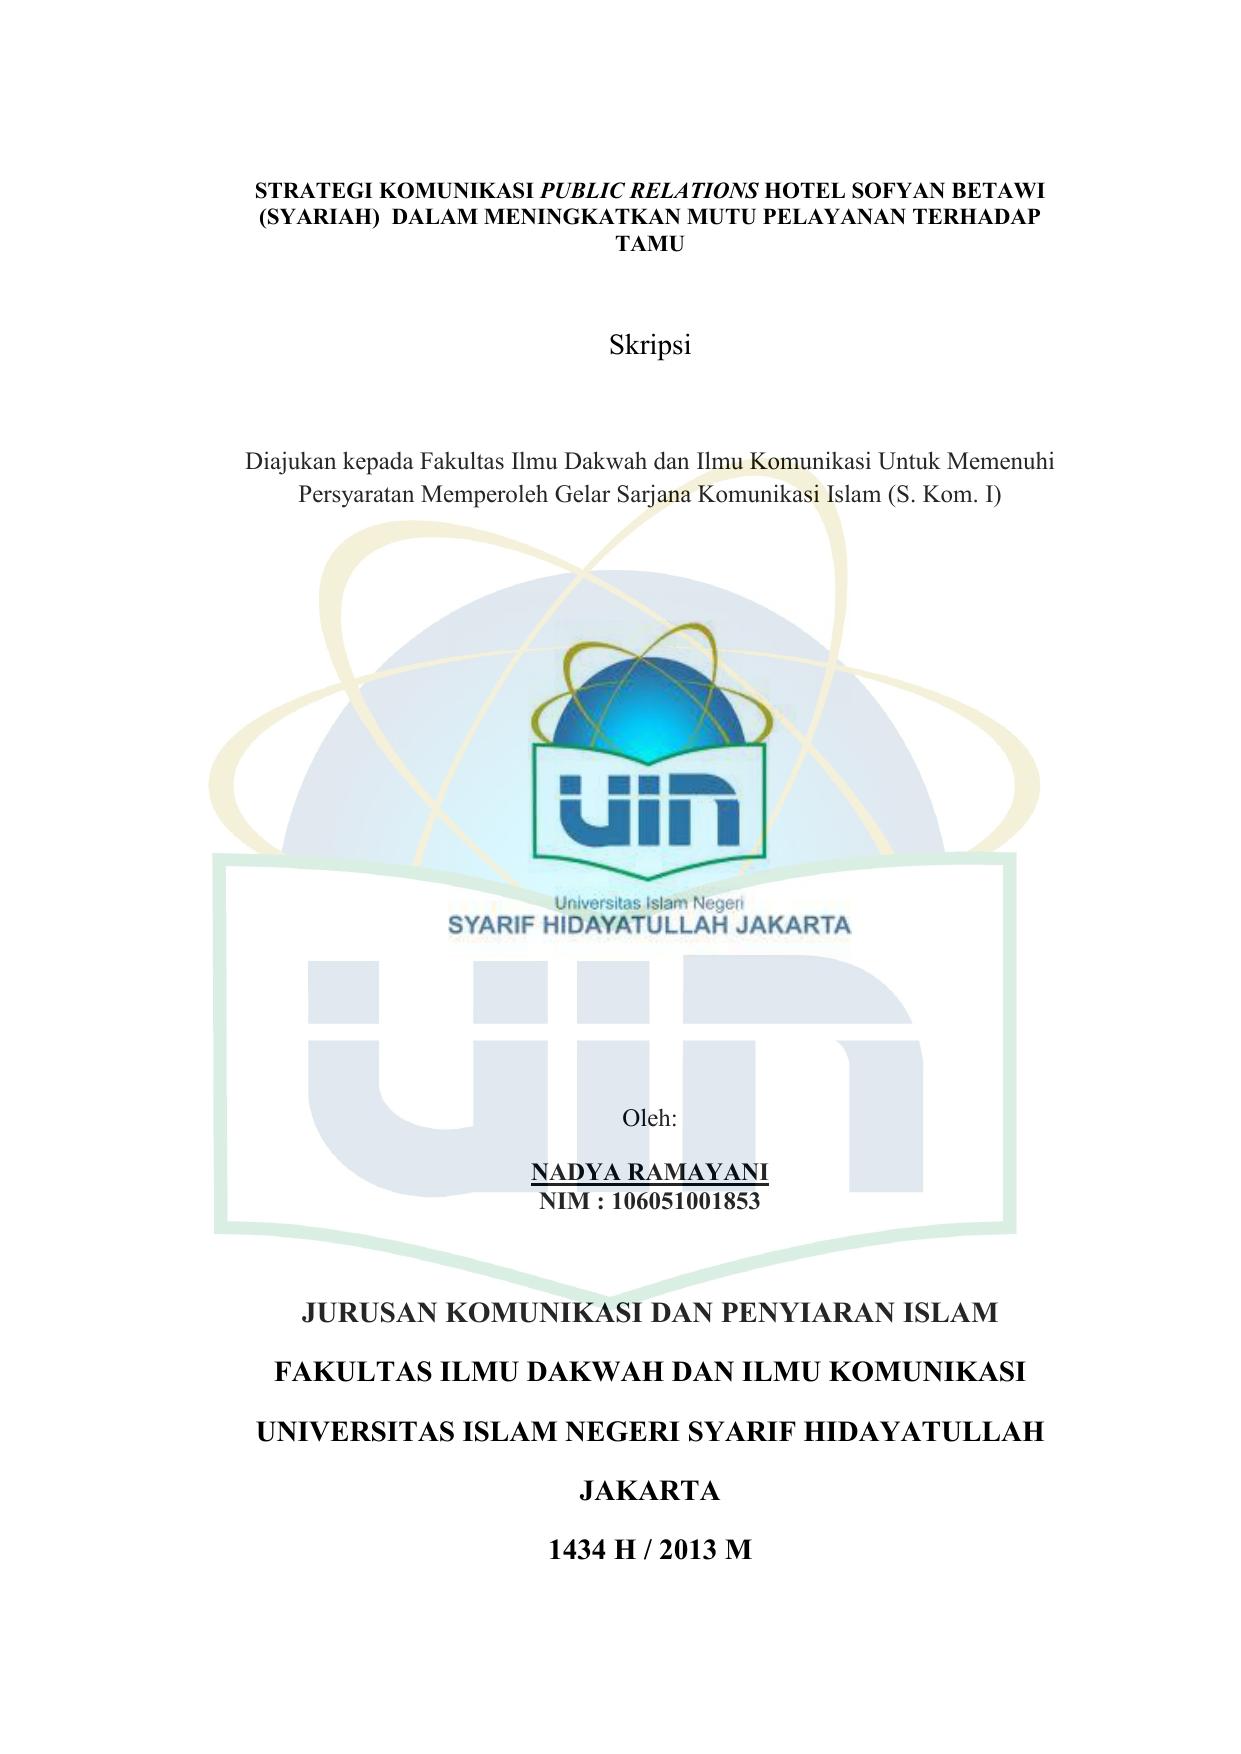 Skripsi Jurusan Komunikasi Dan Penyiaran